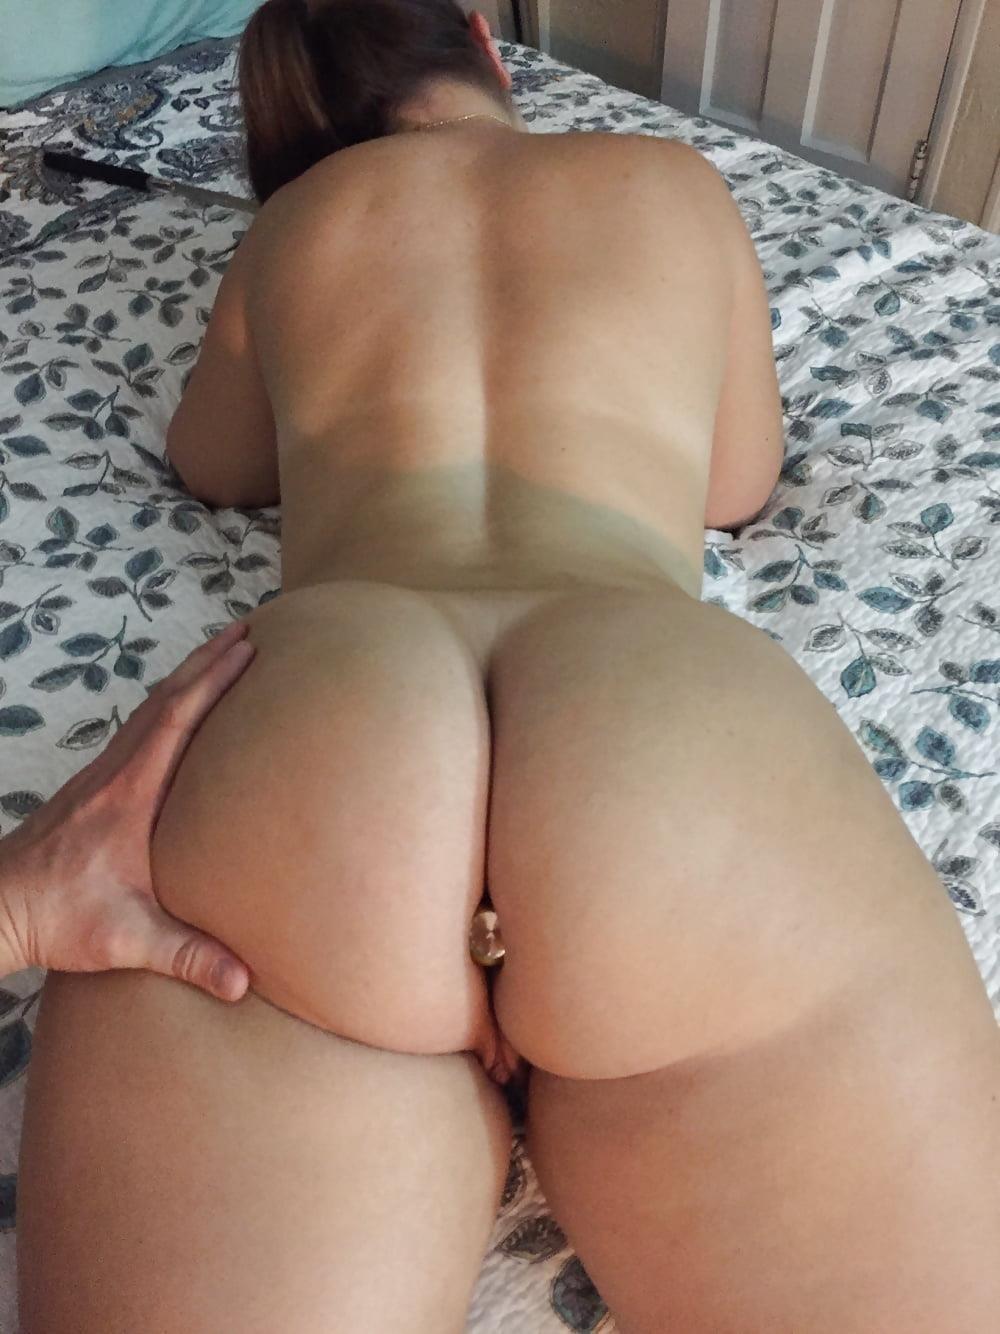 Big booty porn gallery-4042